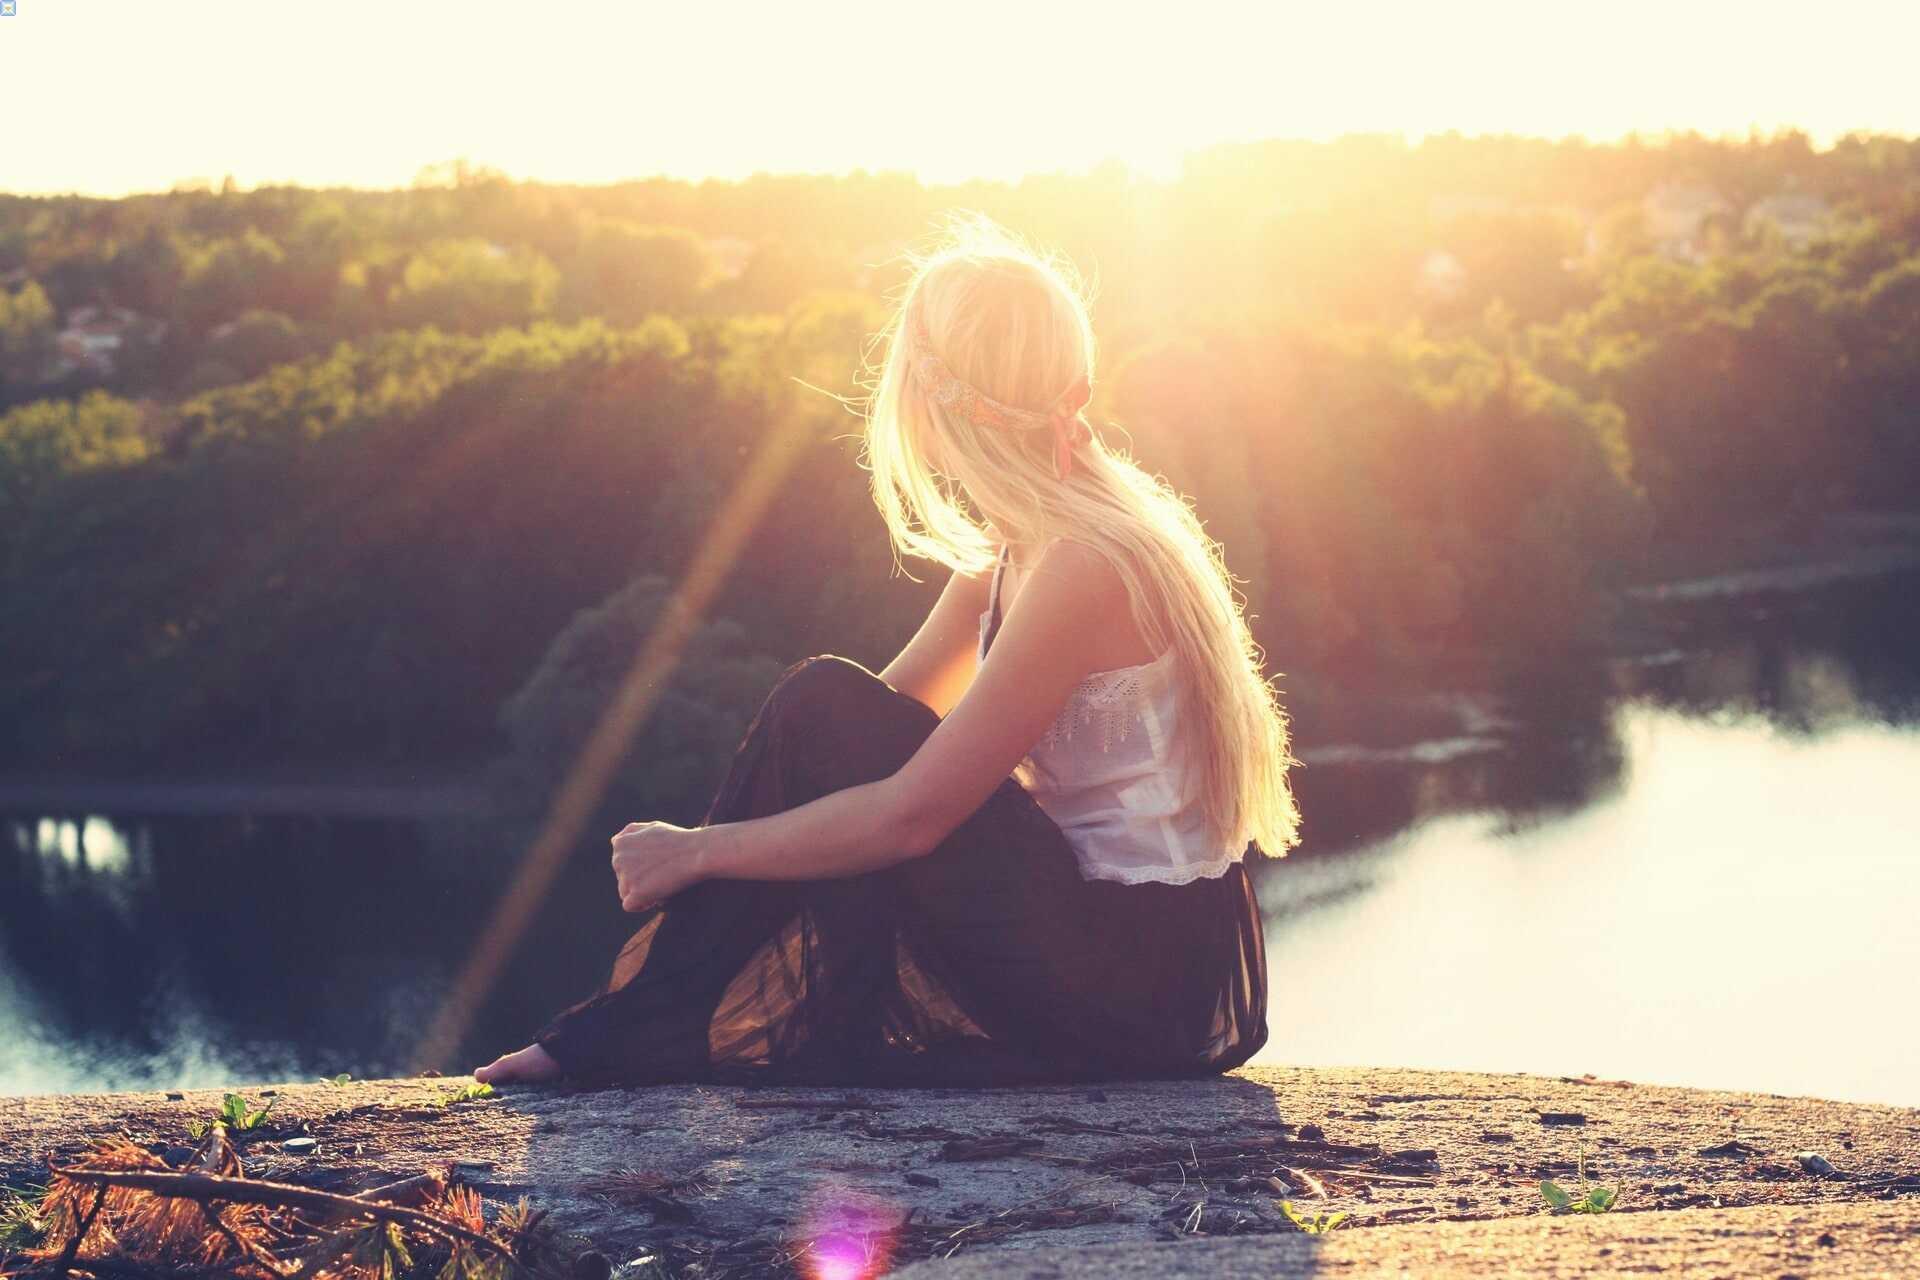 صور بنات جميلة , خلفيات بنات جديده , صور بنات كيوت